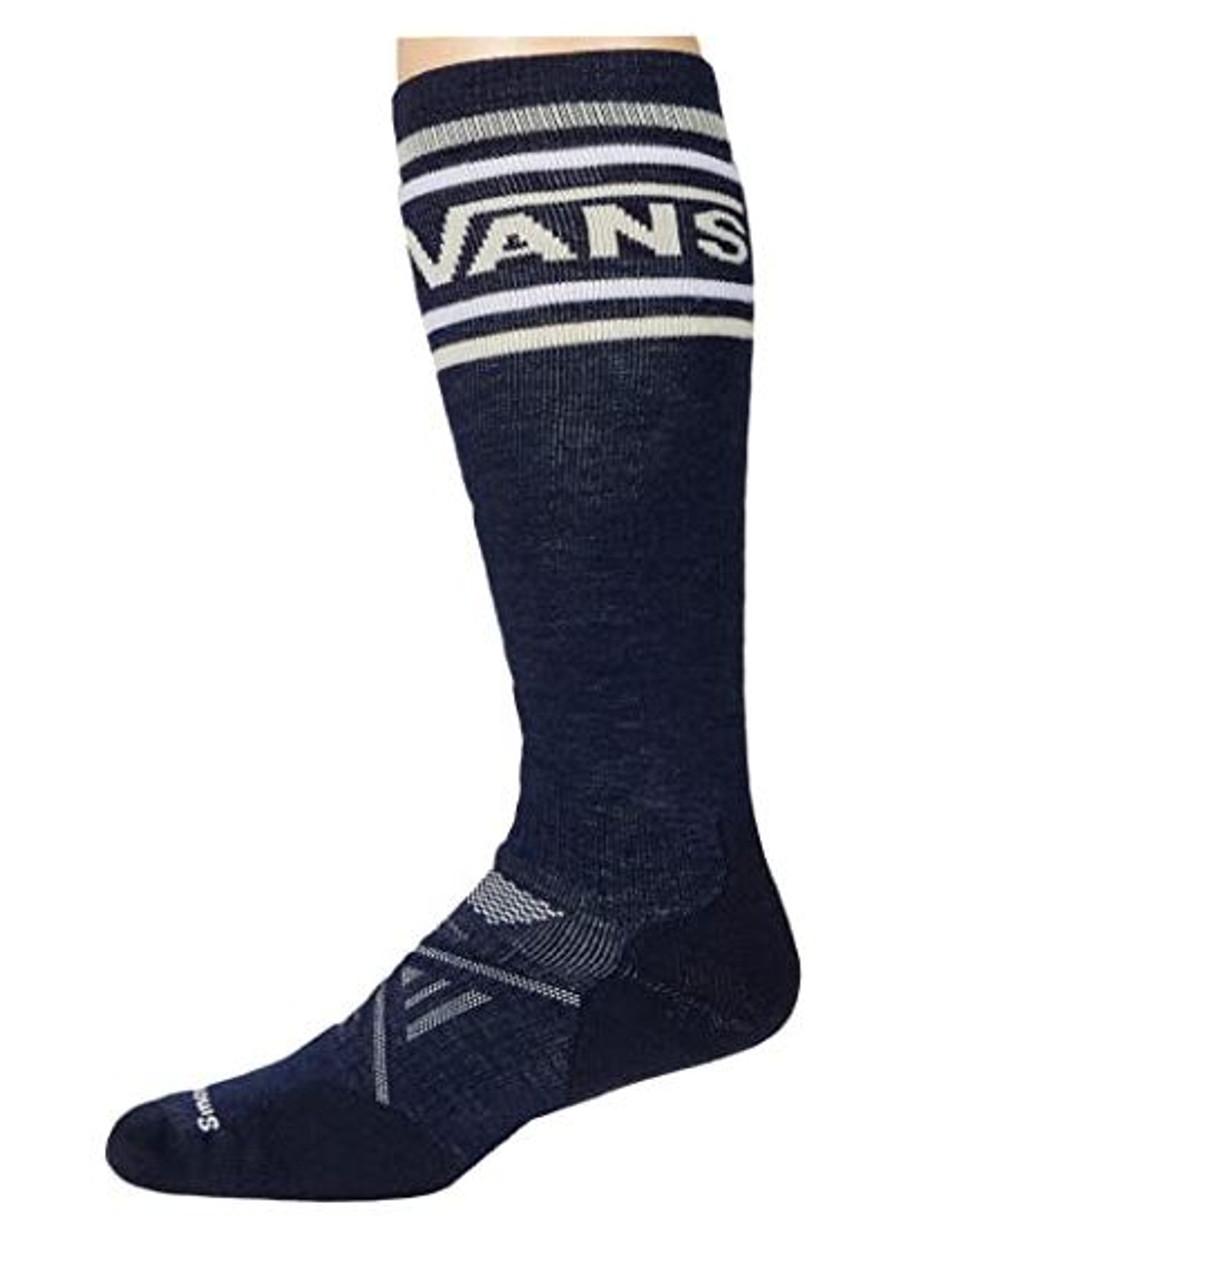 Smartwool Unisex Phd Snow Medium Sock